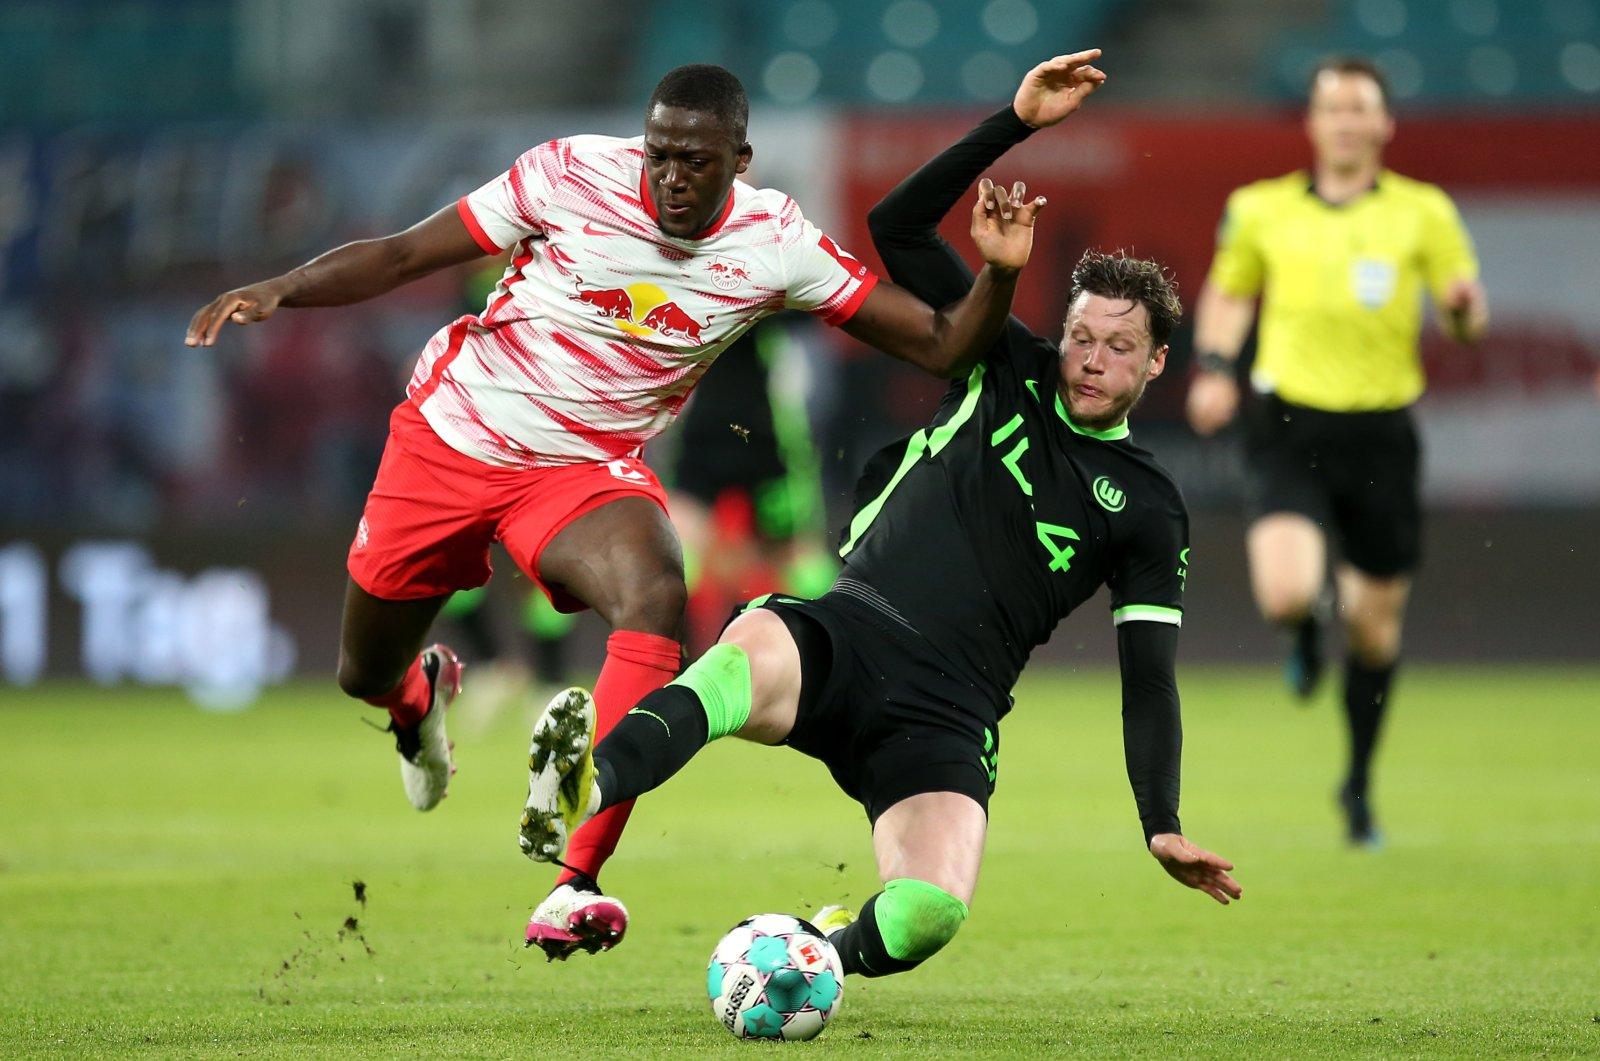 Leipzig's Ibrahima Konate (L) in action against Wolfsburg's Wout Weghorst (R) during a German Bundesliga match, Leipzig, Germany, May 16, 2021. (EPA Photo)